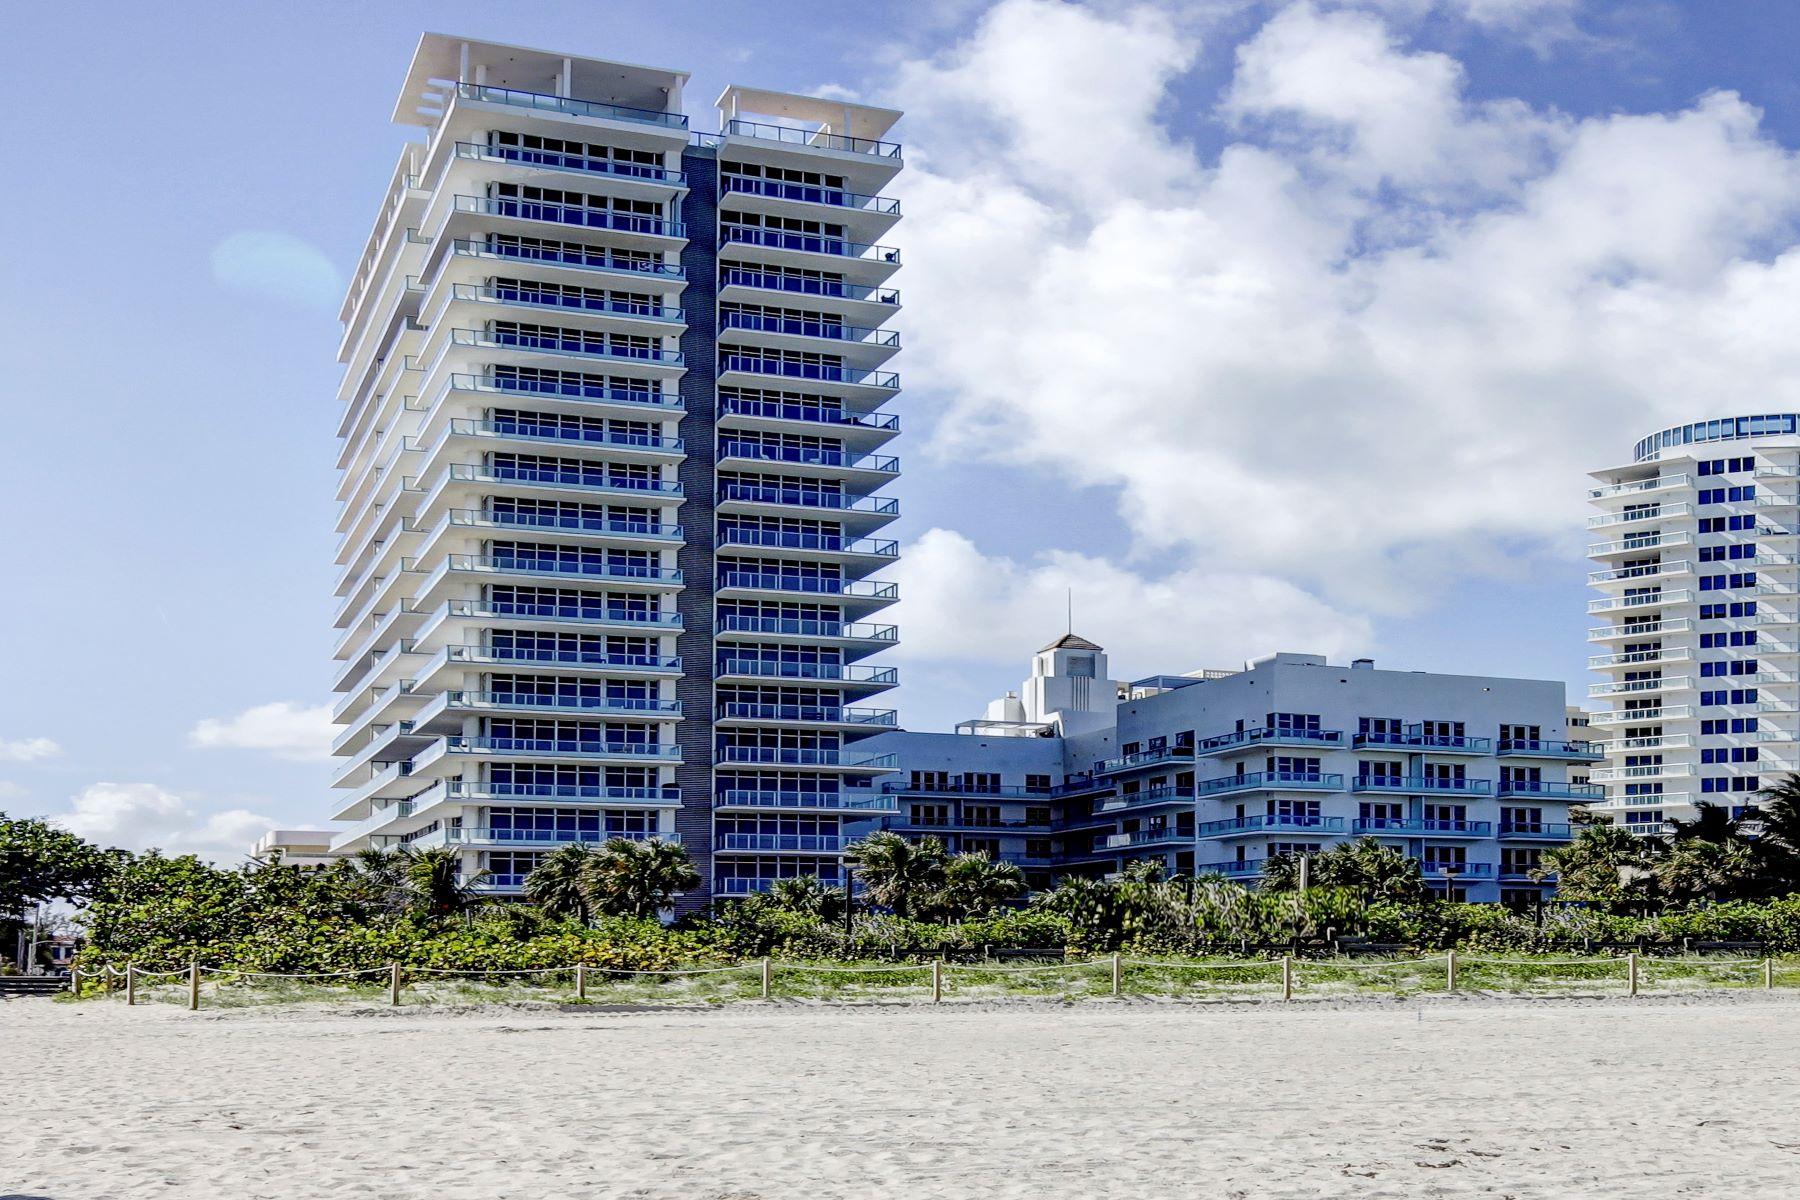 Condominium for Sale at 3737 Collins Ave #S-603 3737 Collins Ave S-603, Miami Beach, Florida, 33140 United States